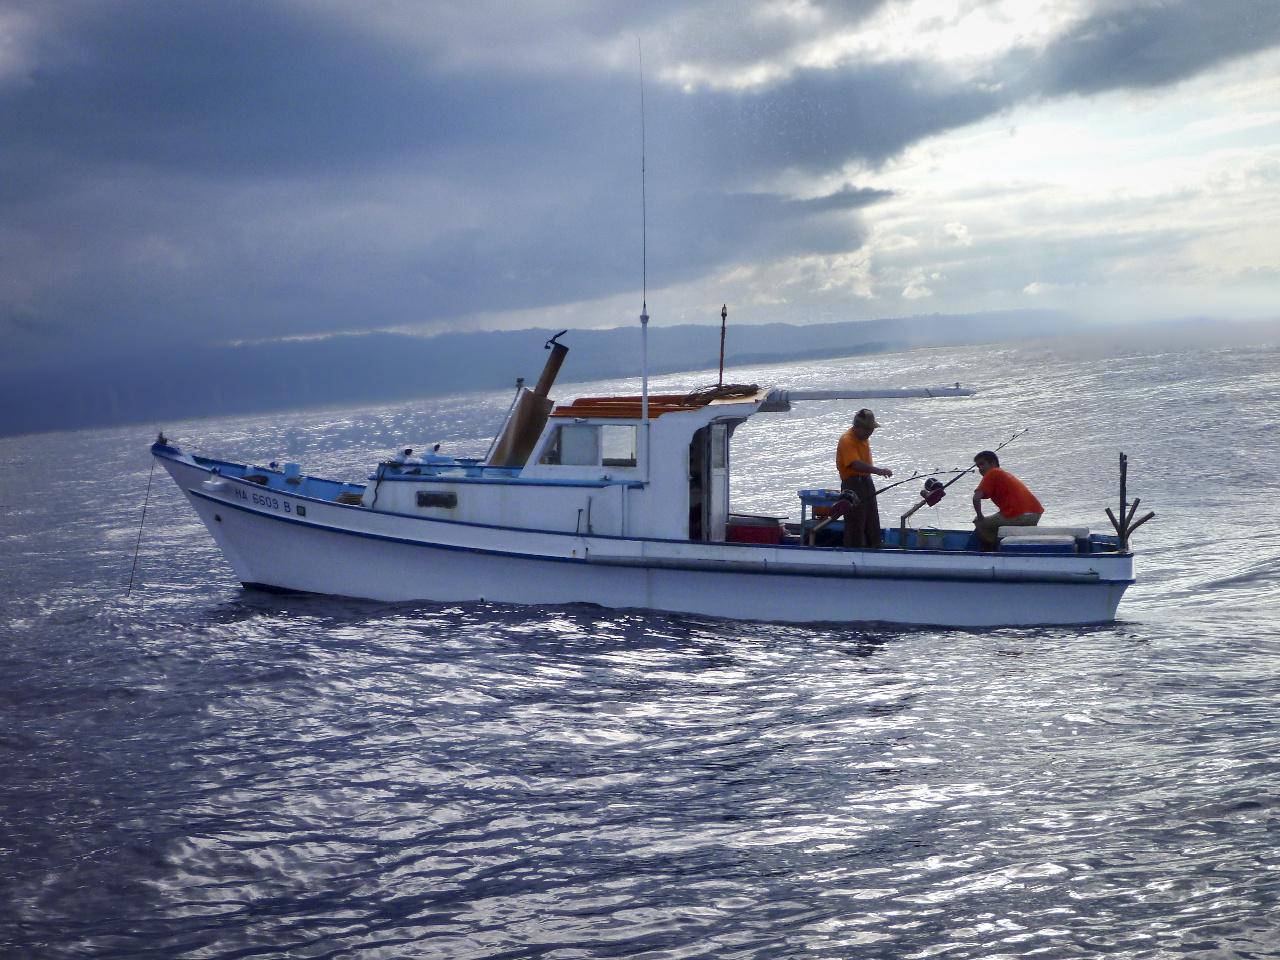 Sampan bottomfishing with Masa Ibata. Masa will be sharing his bottomfishing heritage in the coming weeks. Photo courtesy of Masa Ibata